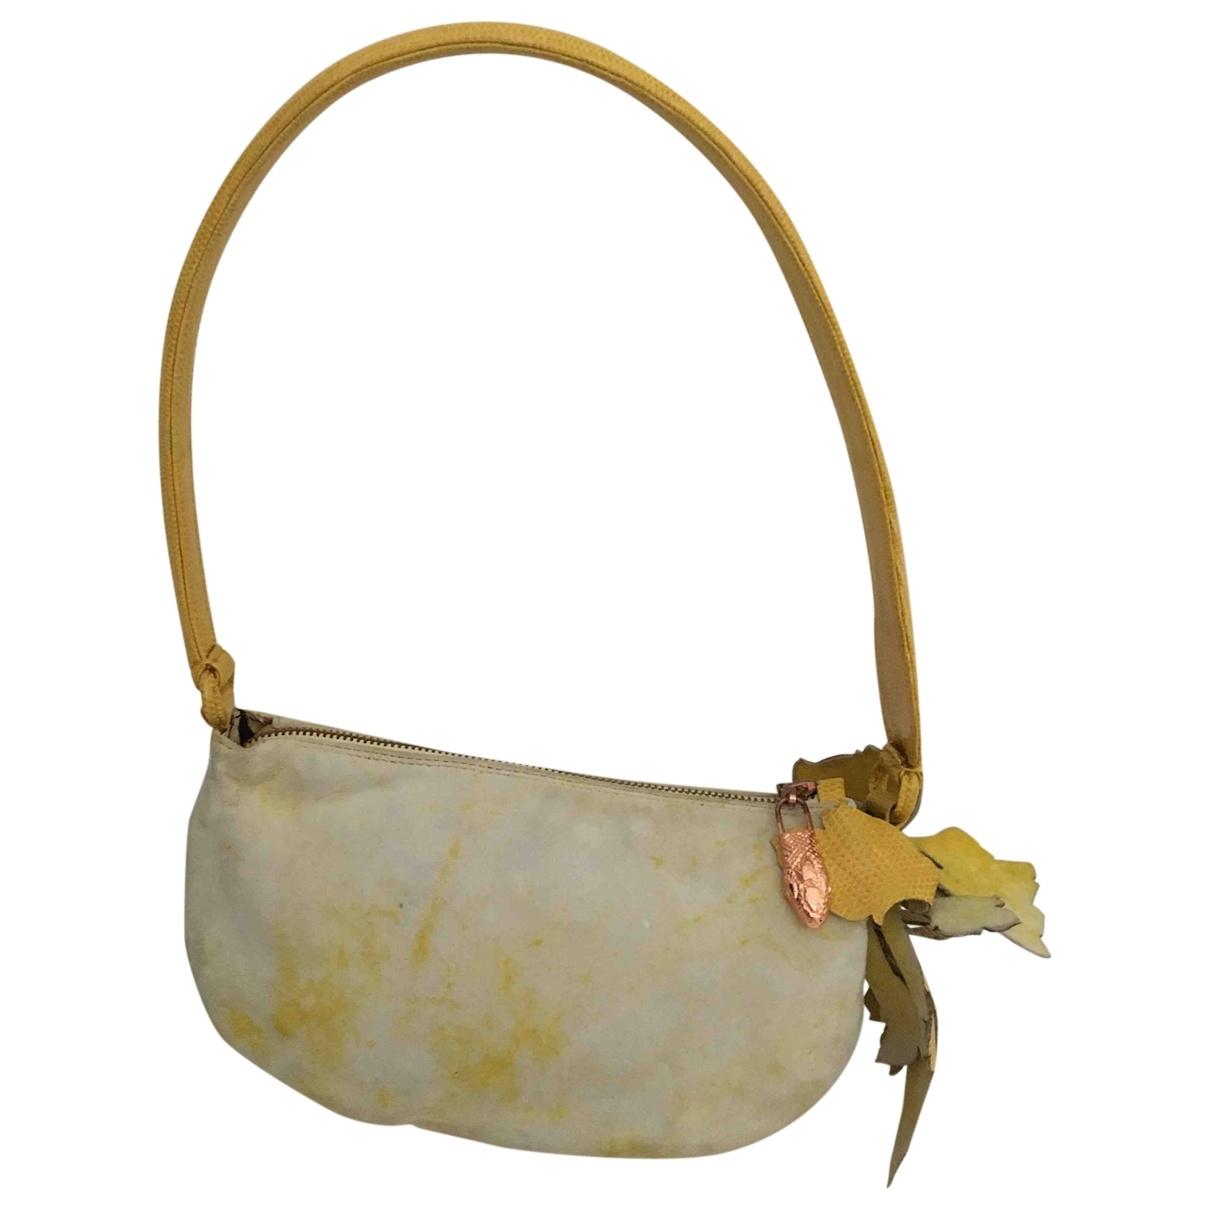 Roberto Cavalli \N Yellow Lizard handbag for Women \N